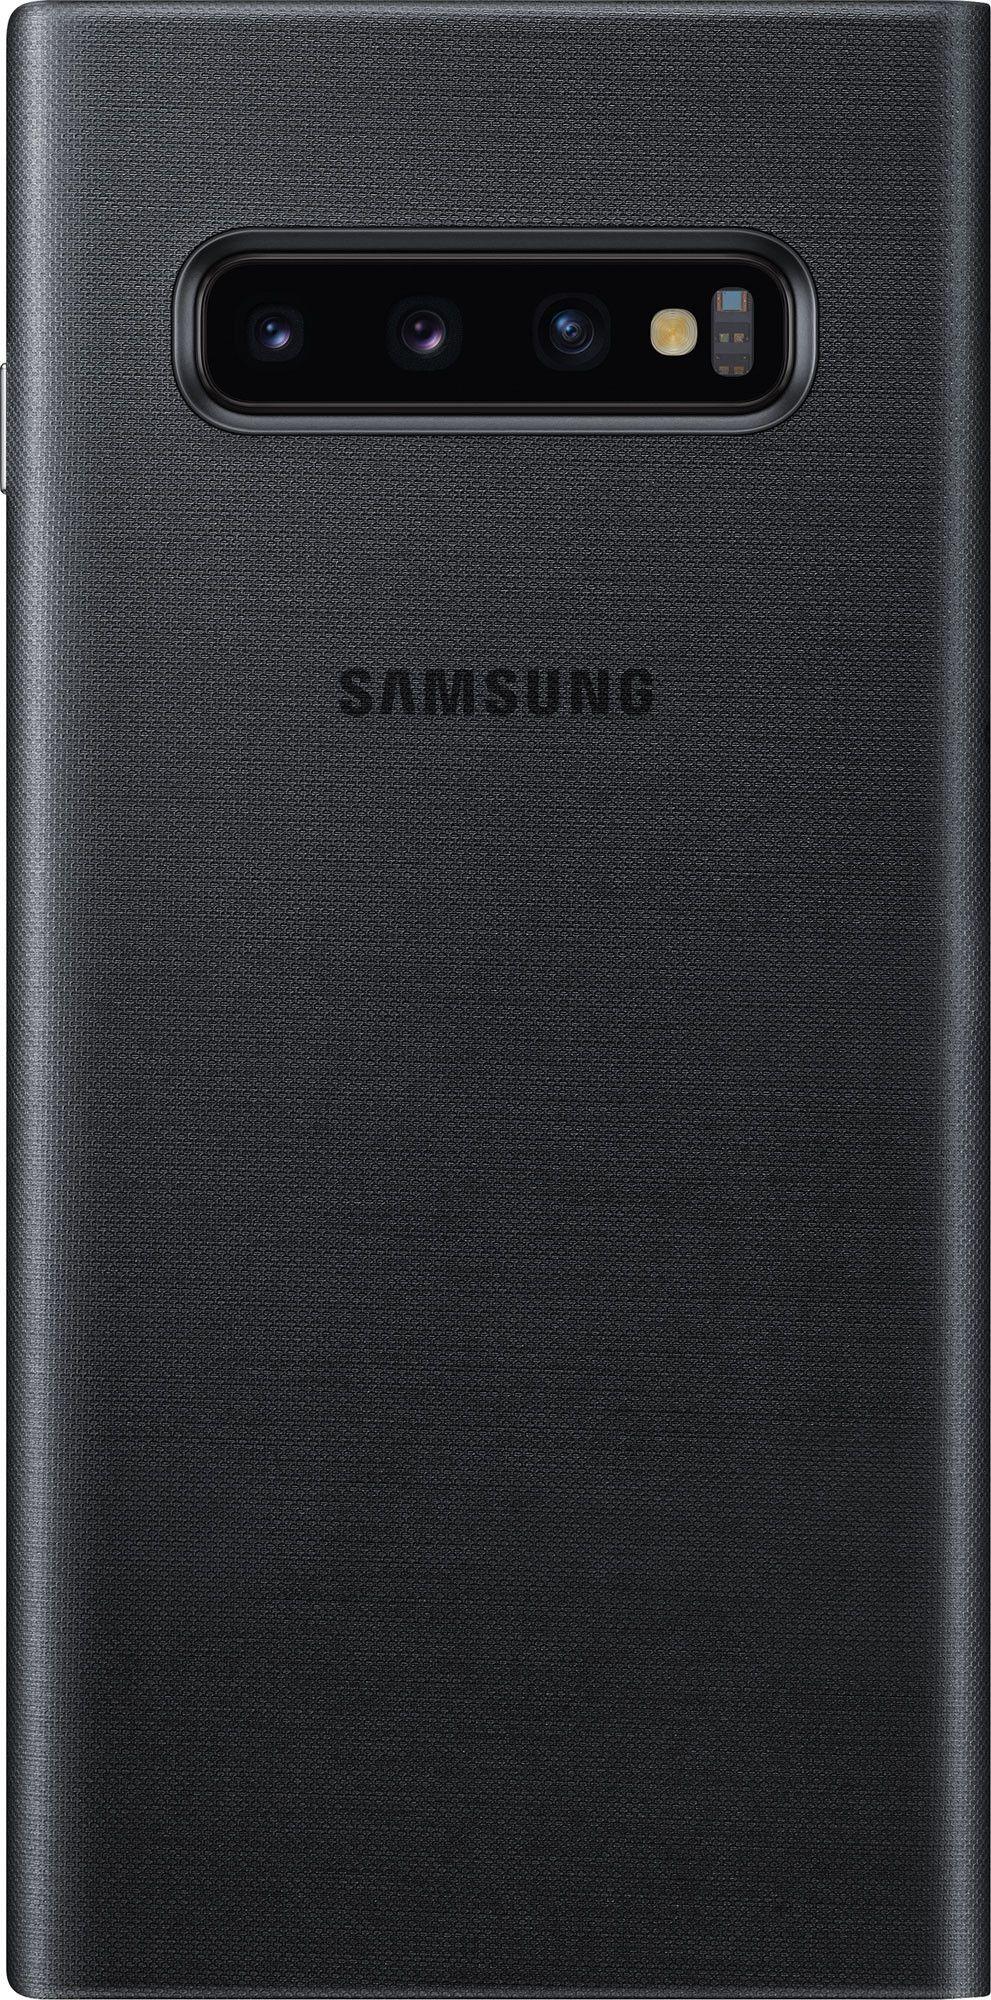 Чехол-книжка Samsung LED View Cover для Samsung Galaxy S10 (EF-NG973PBEGRU) Black от Територія твоєї техніки - 3